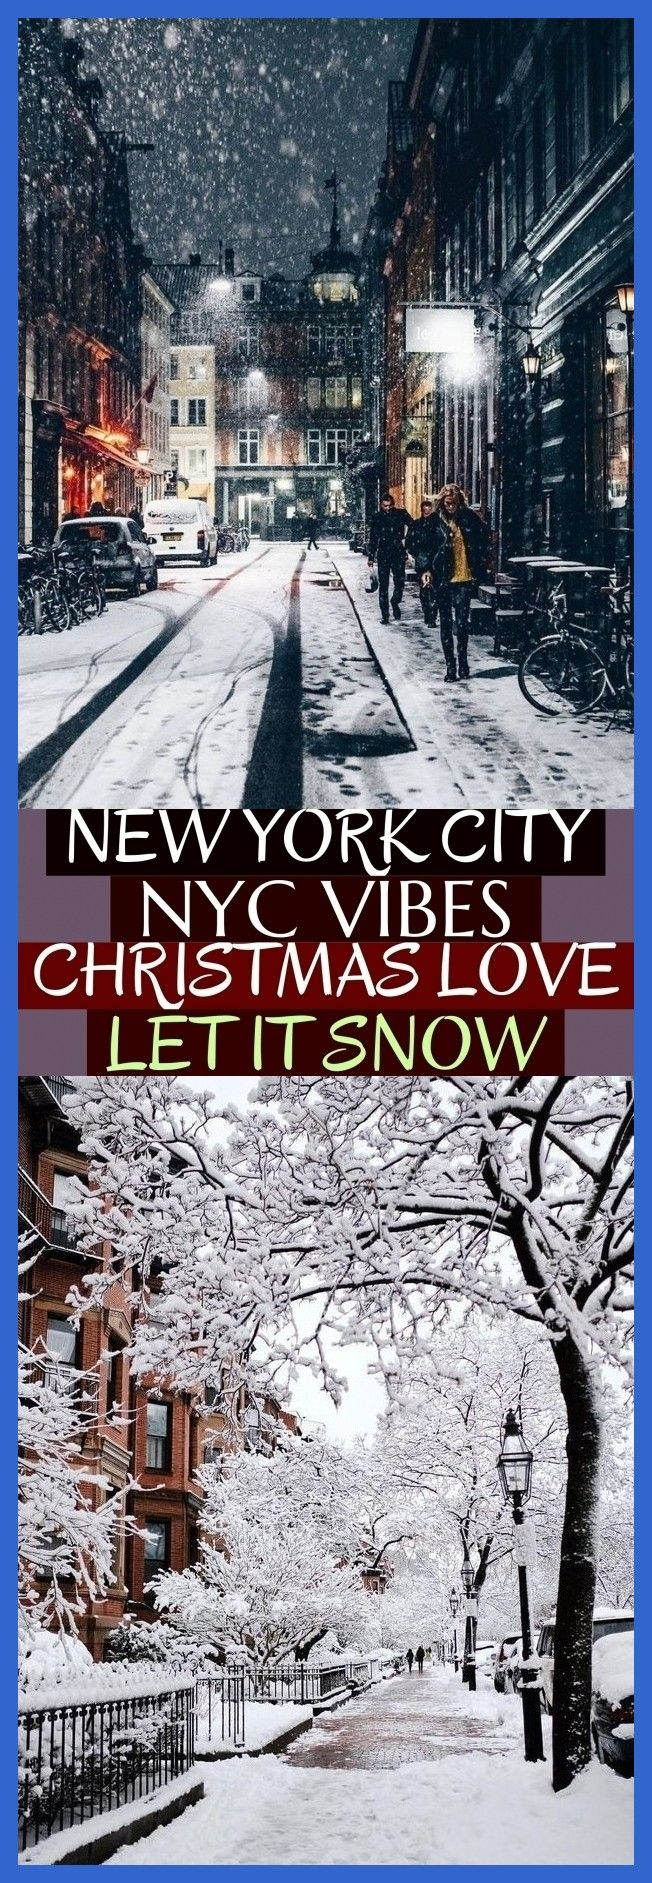 More Than 44 45dddeb2c5913e   York city, New york city, Christmas love